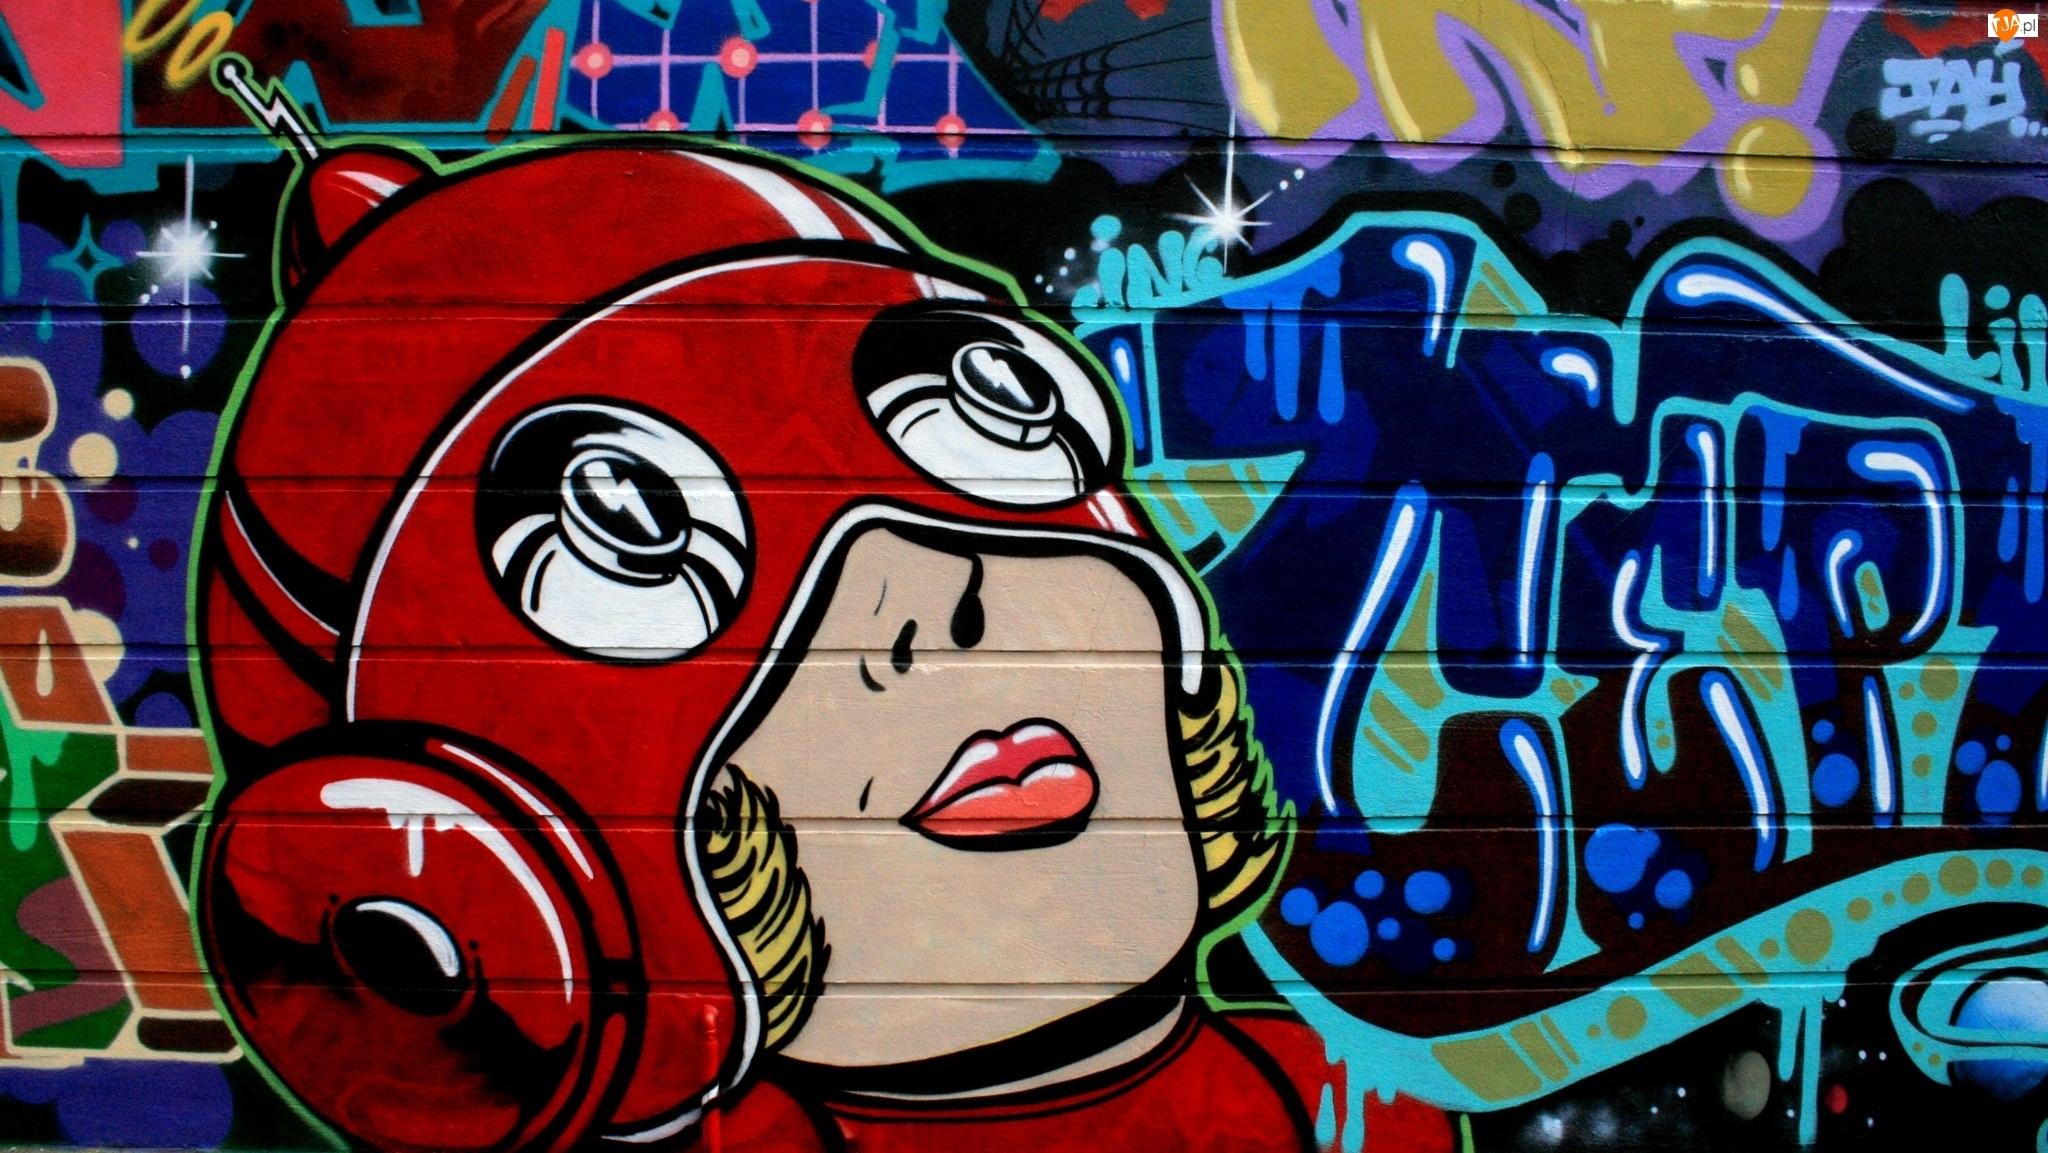 Kobieta, Mural, Street art